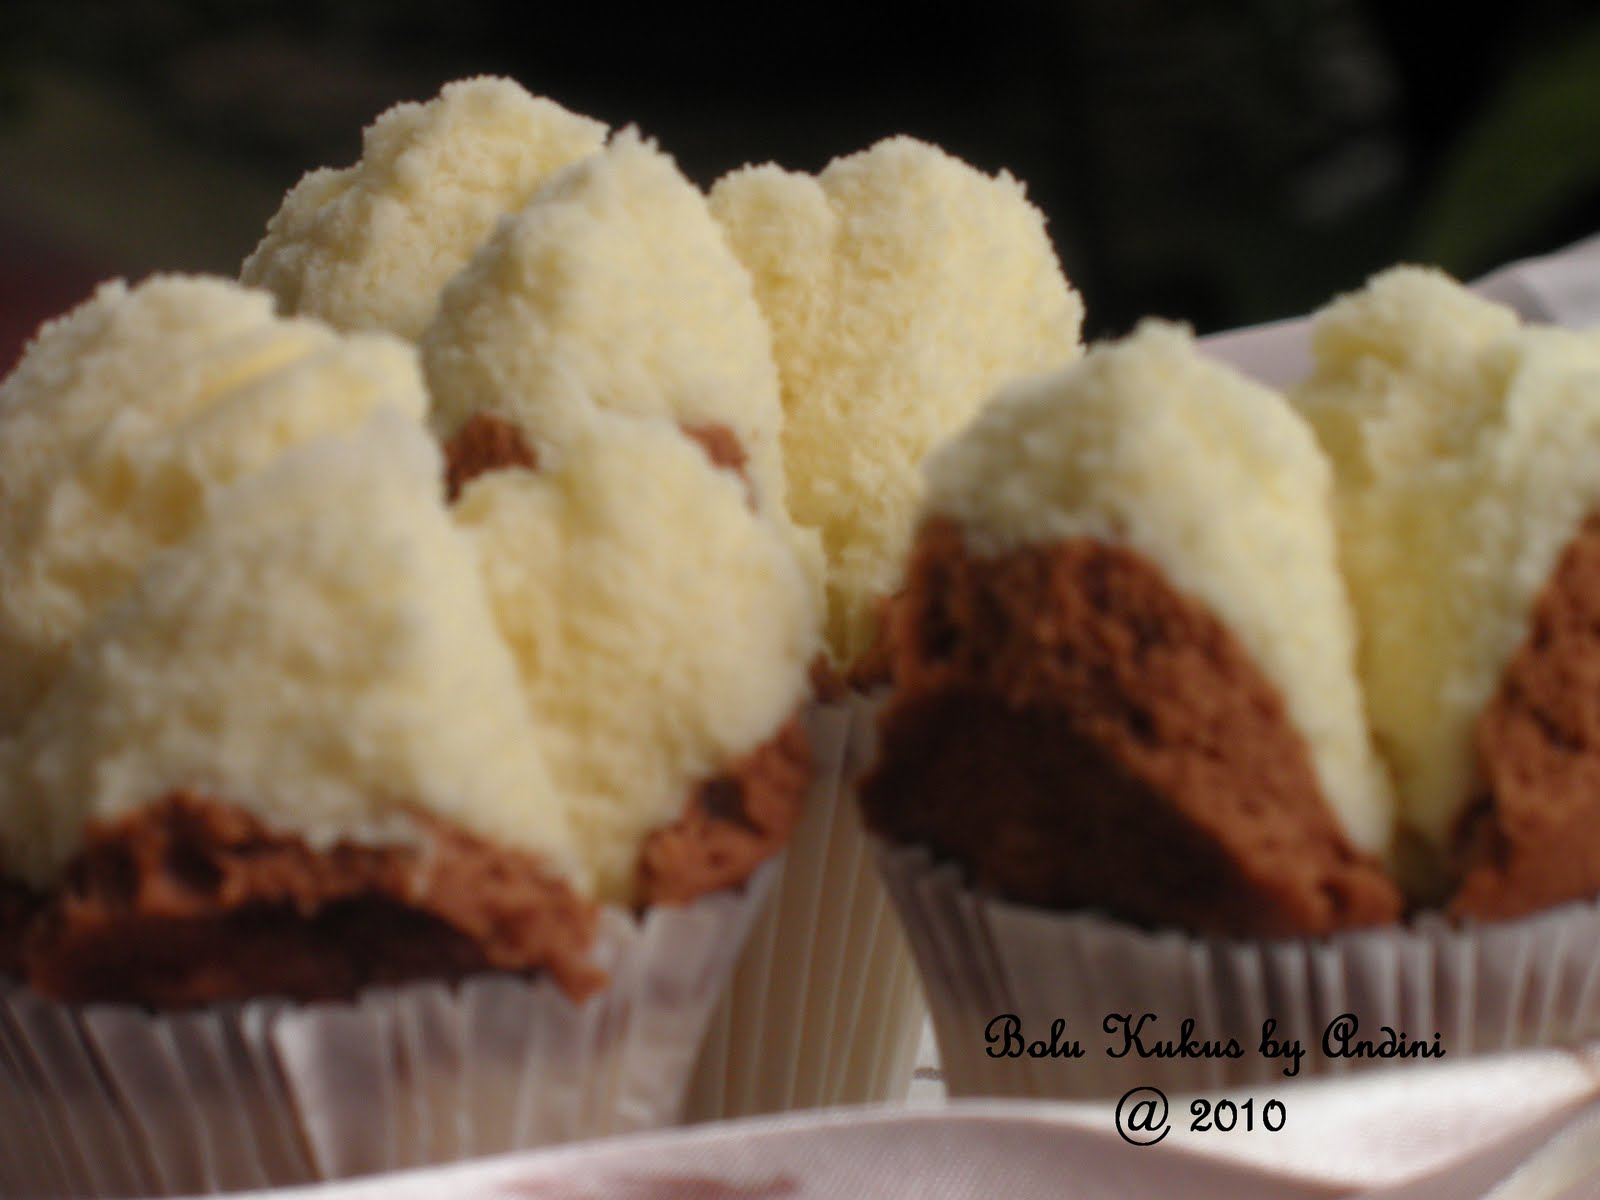 Resep Cake Coklat Kukus Ncc: RESEP MARTABAK ASIN MINI NCC